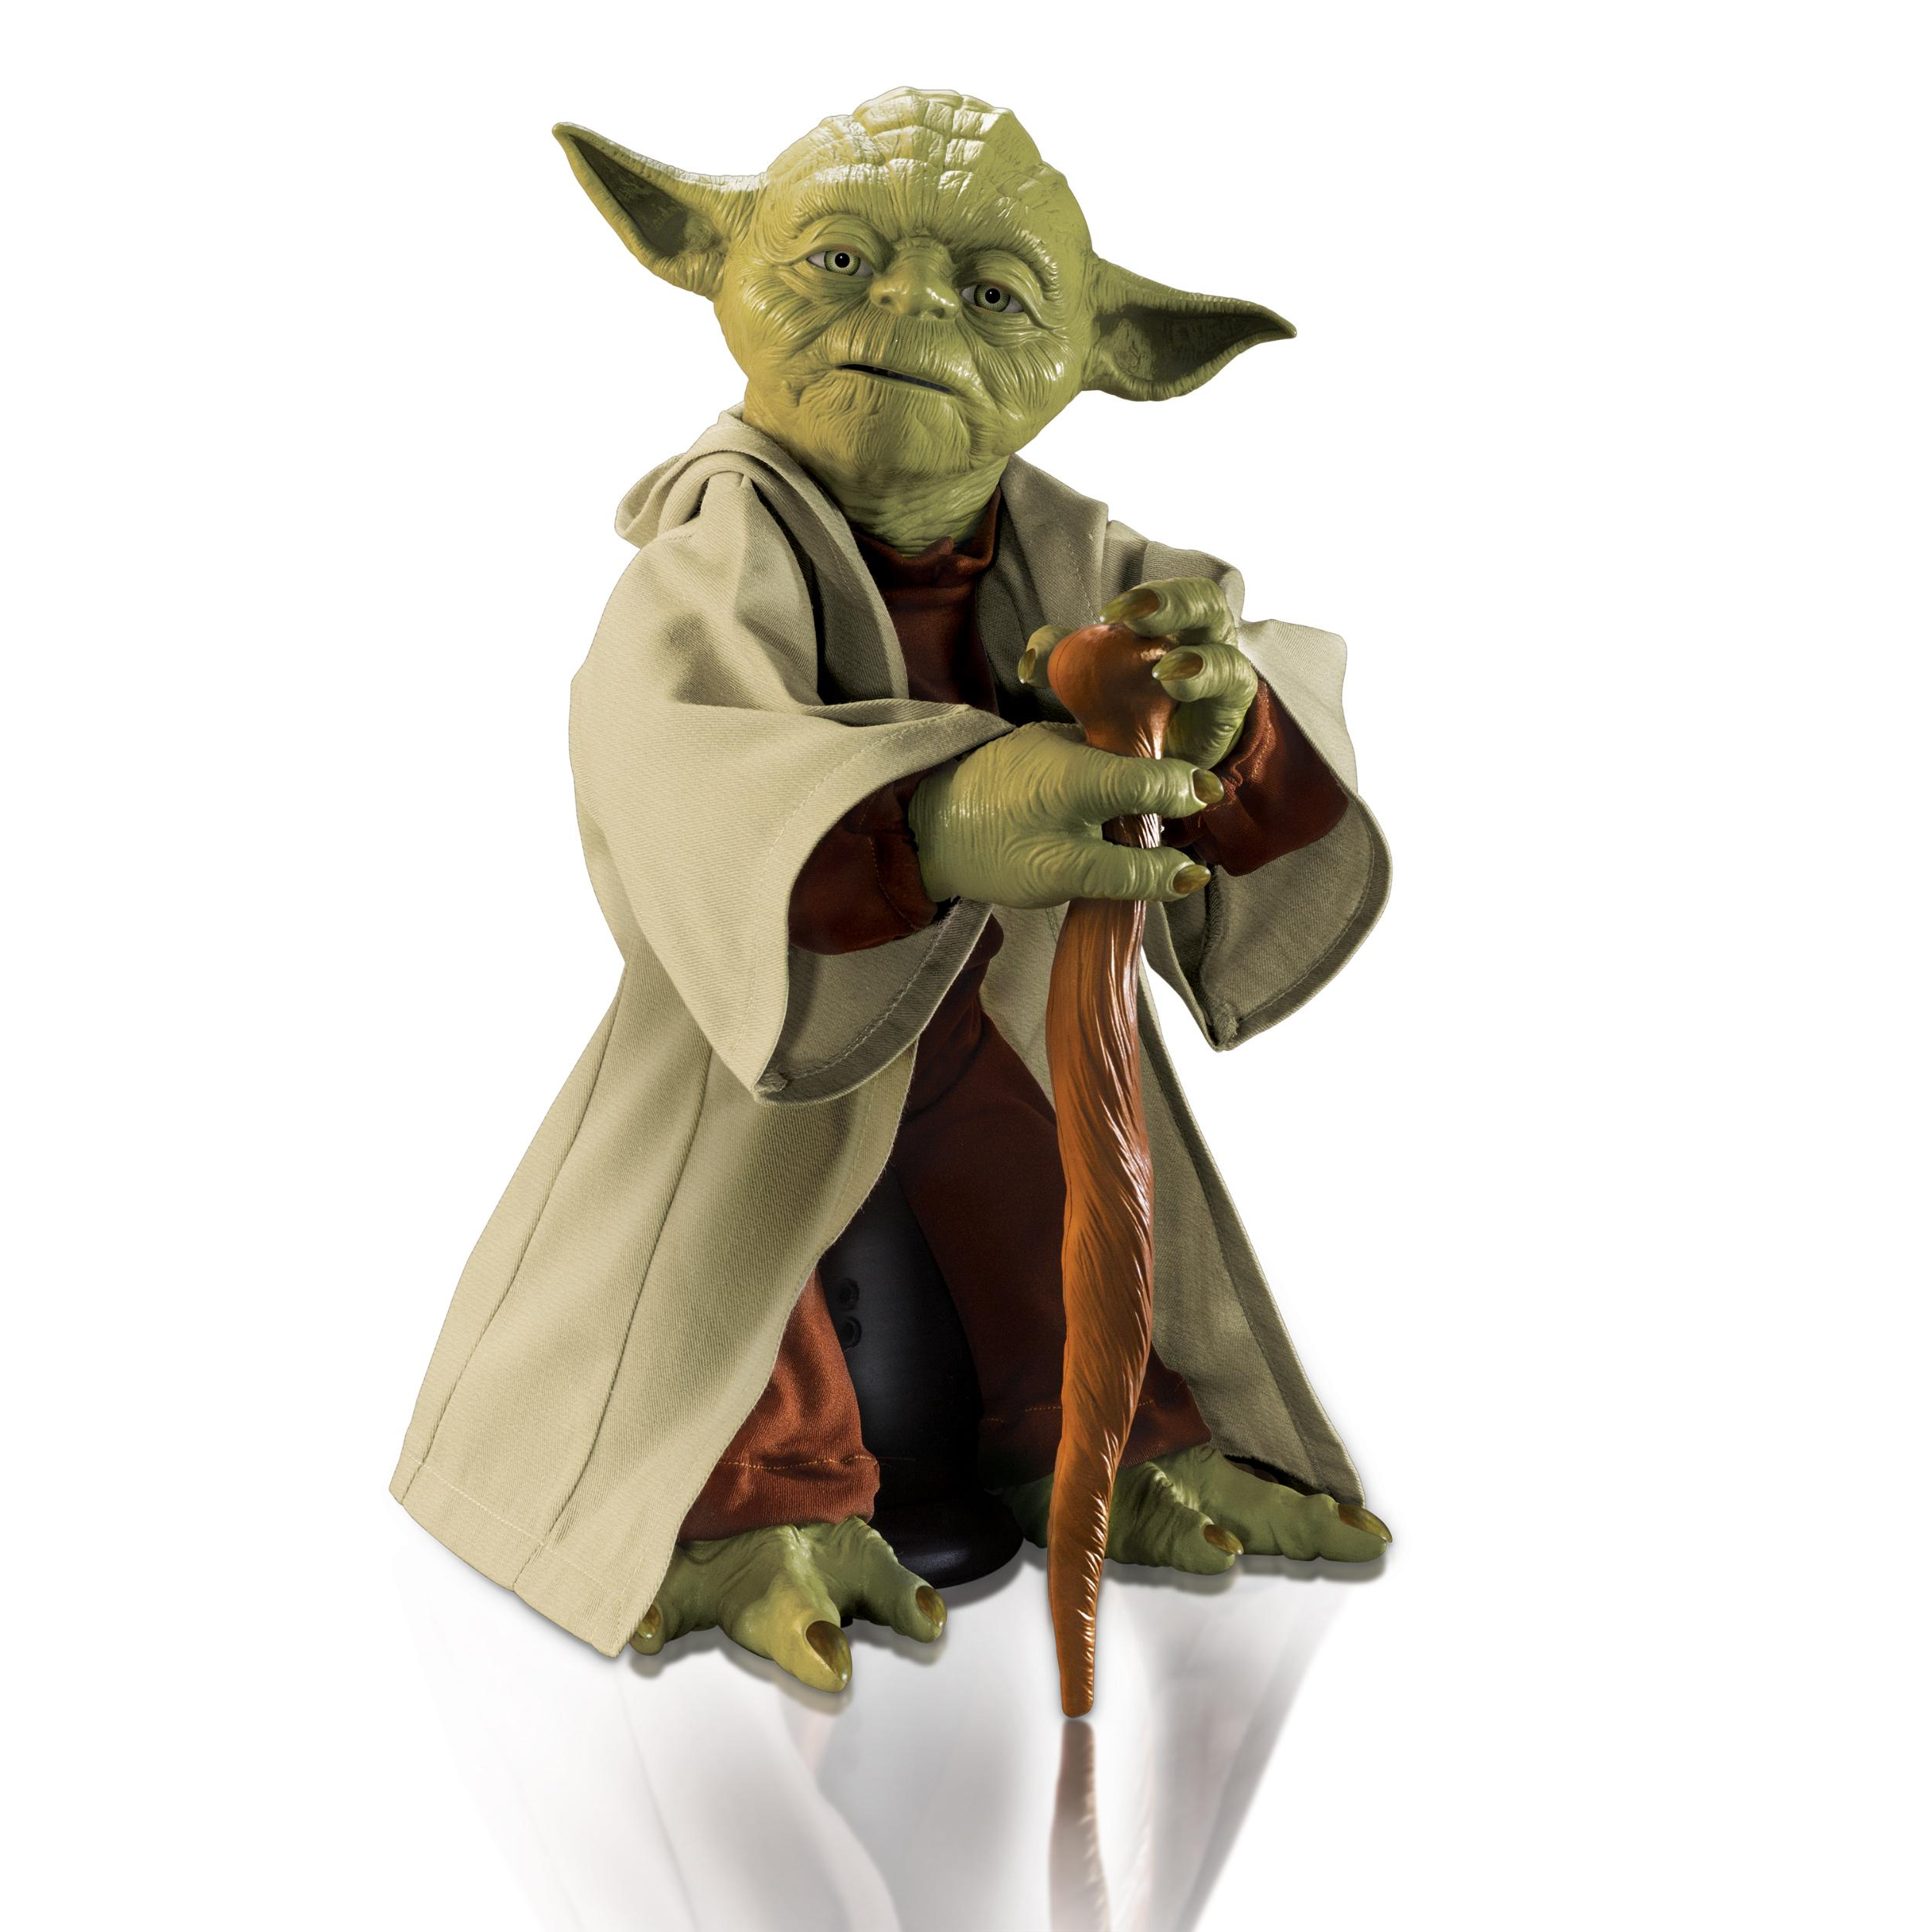 Star Wars Interactive Legendary Jedi Master Yoda New